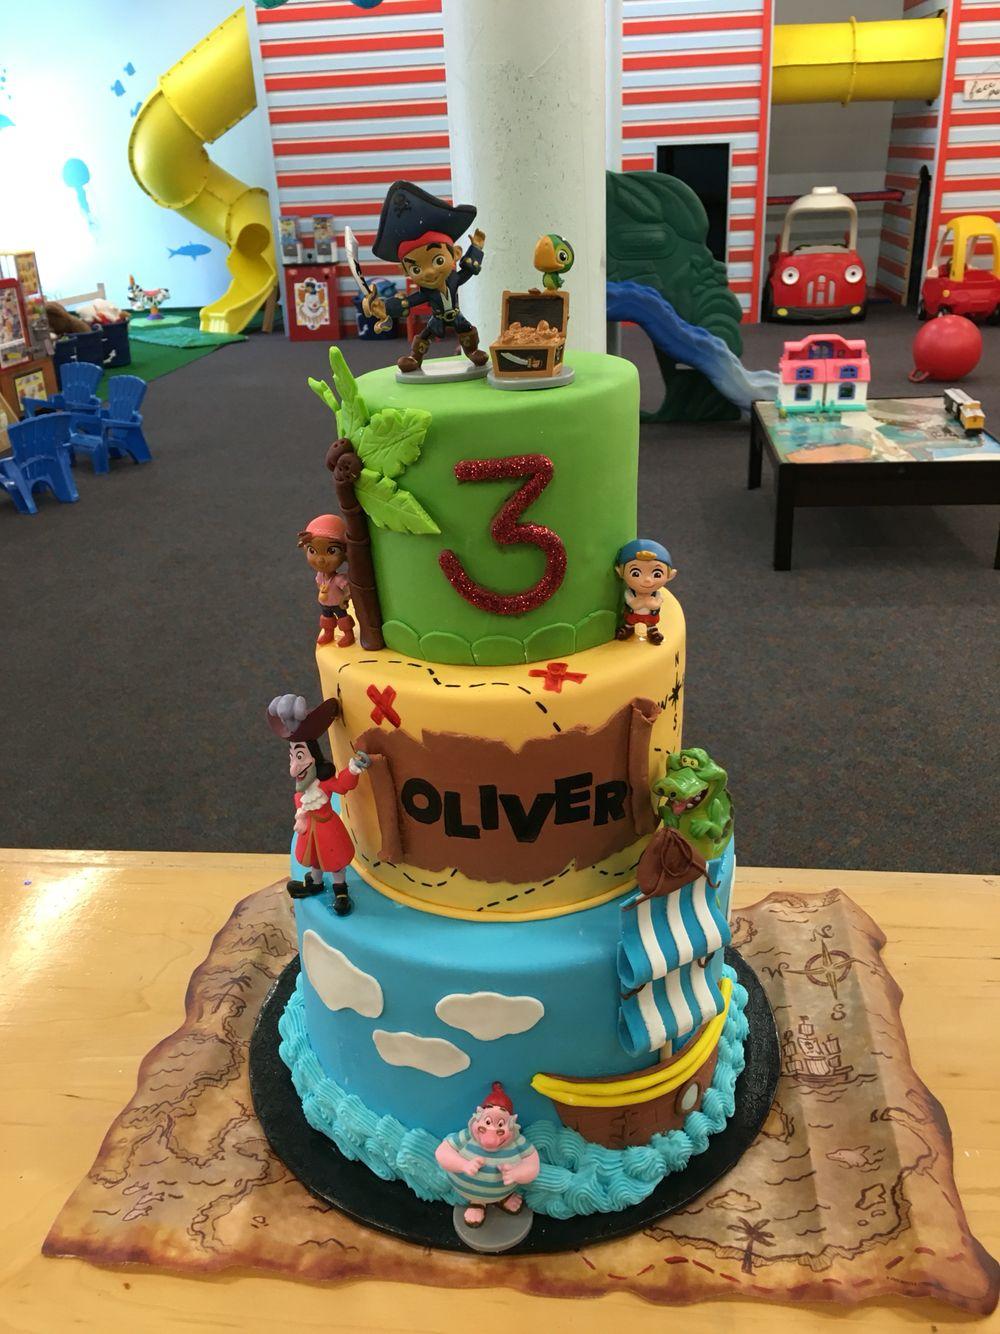 Jake and the neverland pirates cake Pirate birthday Jake and the